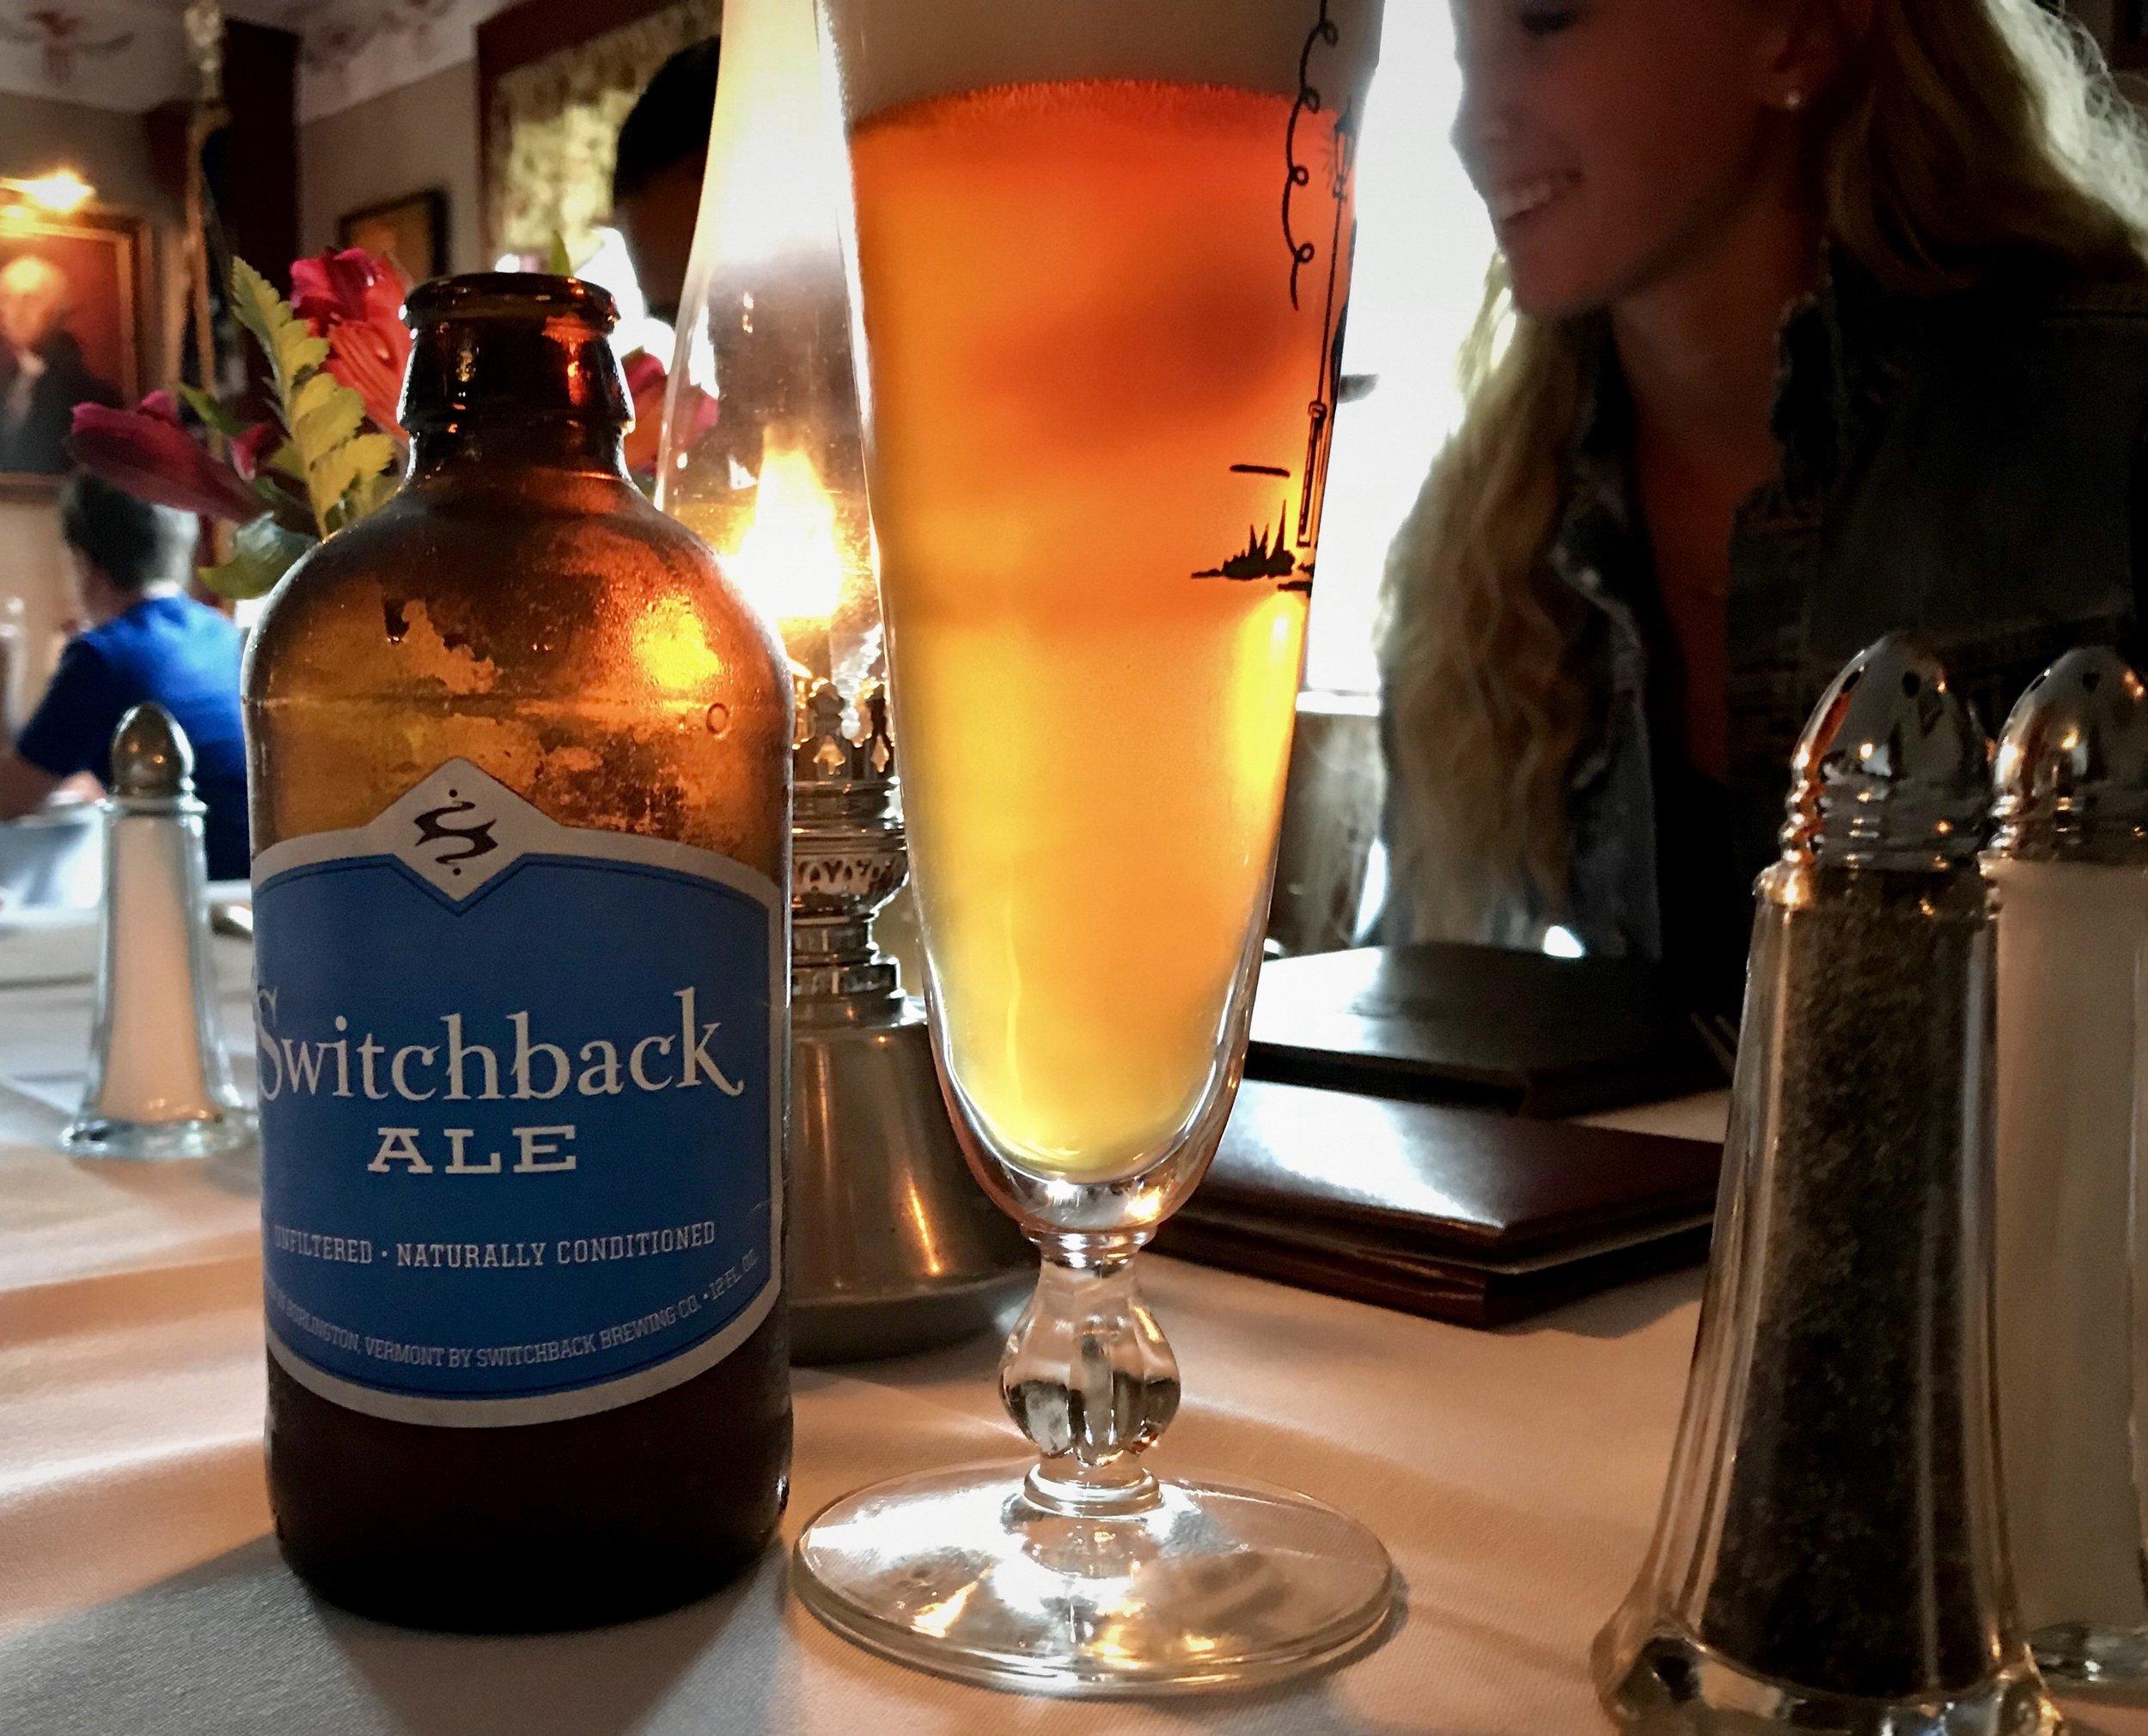 Switchback on table with pilsner taken by Dan Bibbens Table 34 July 2018.jpeg